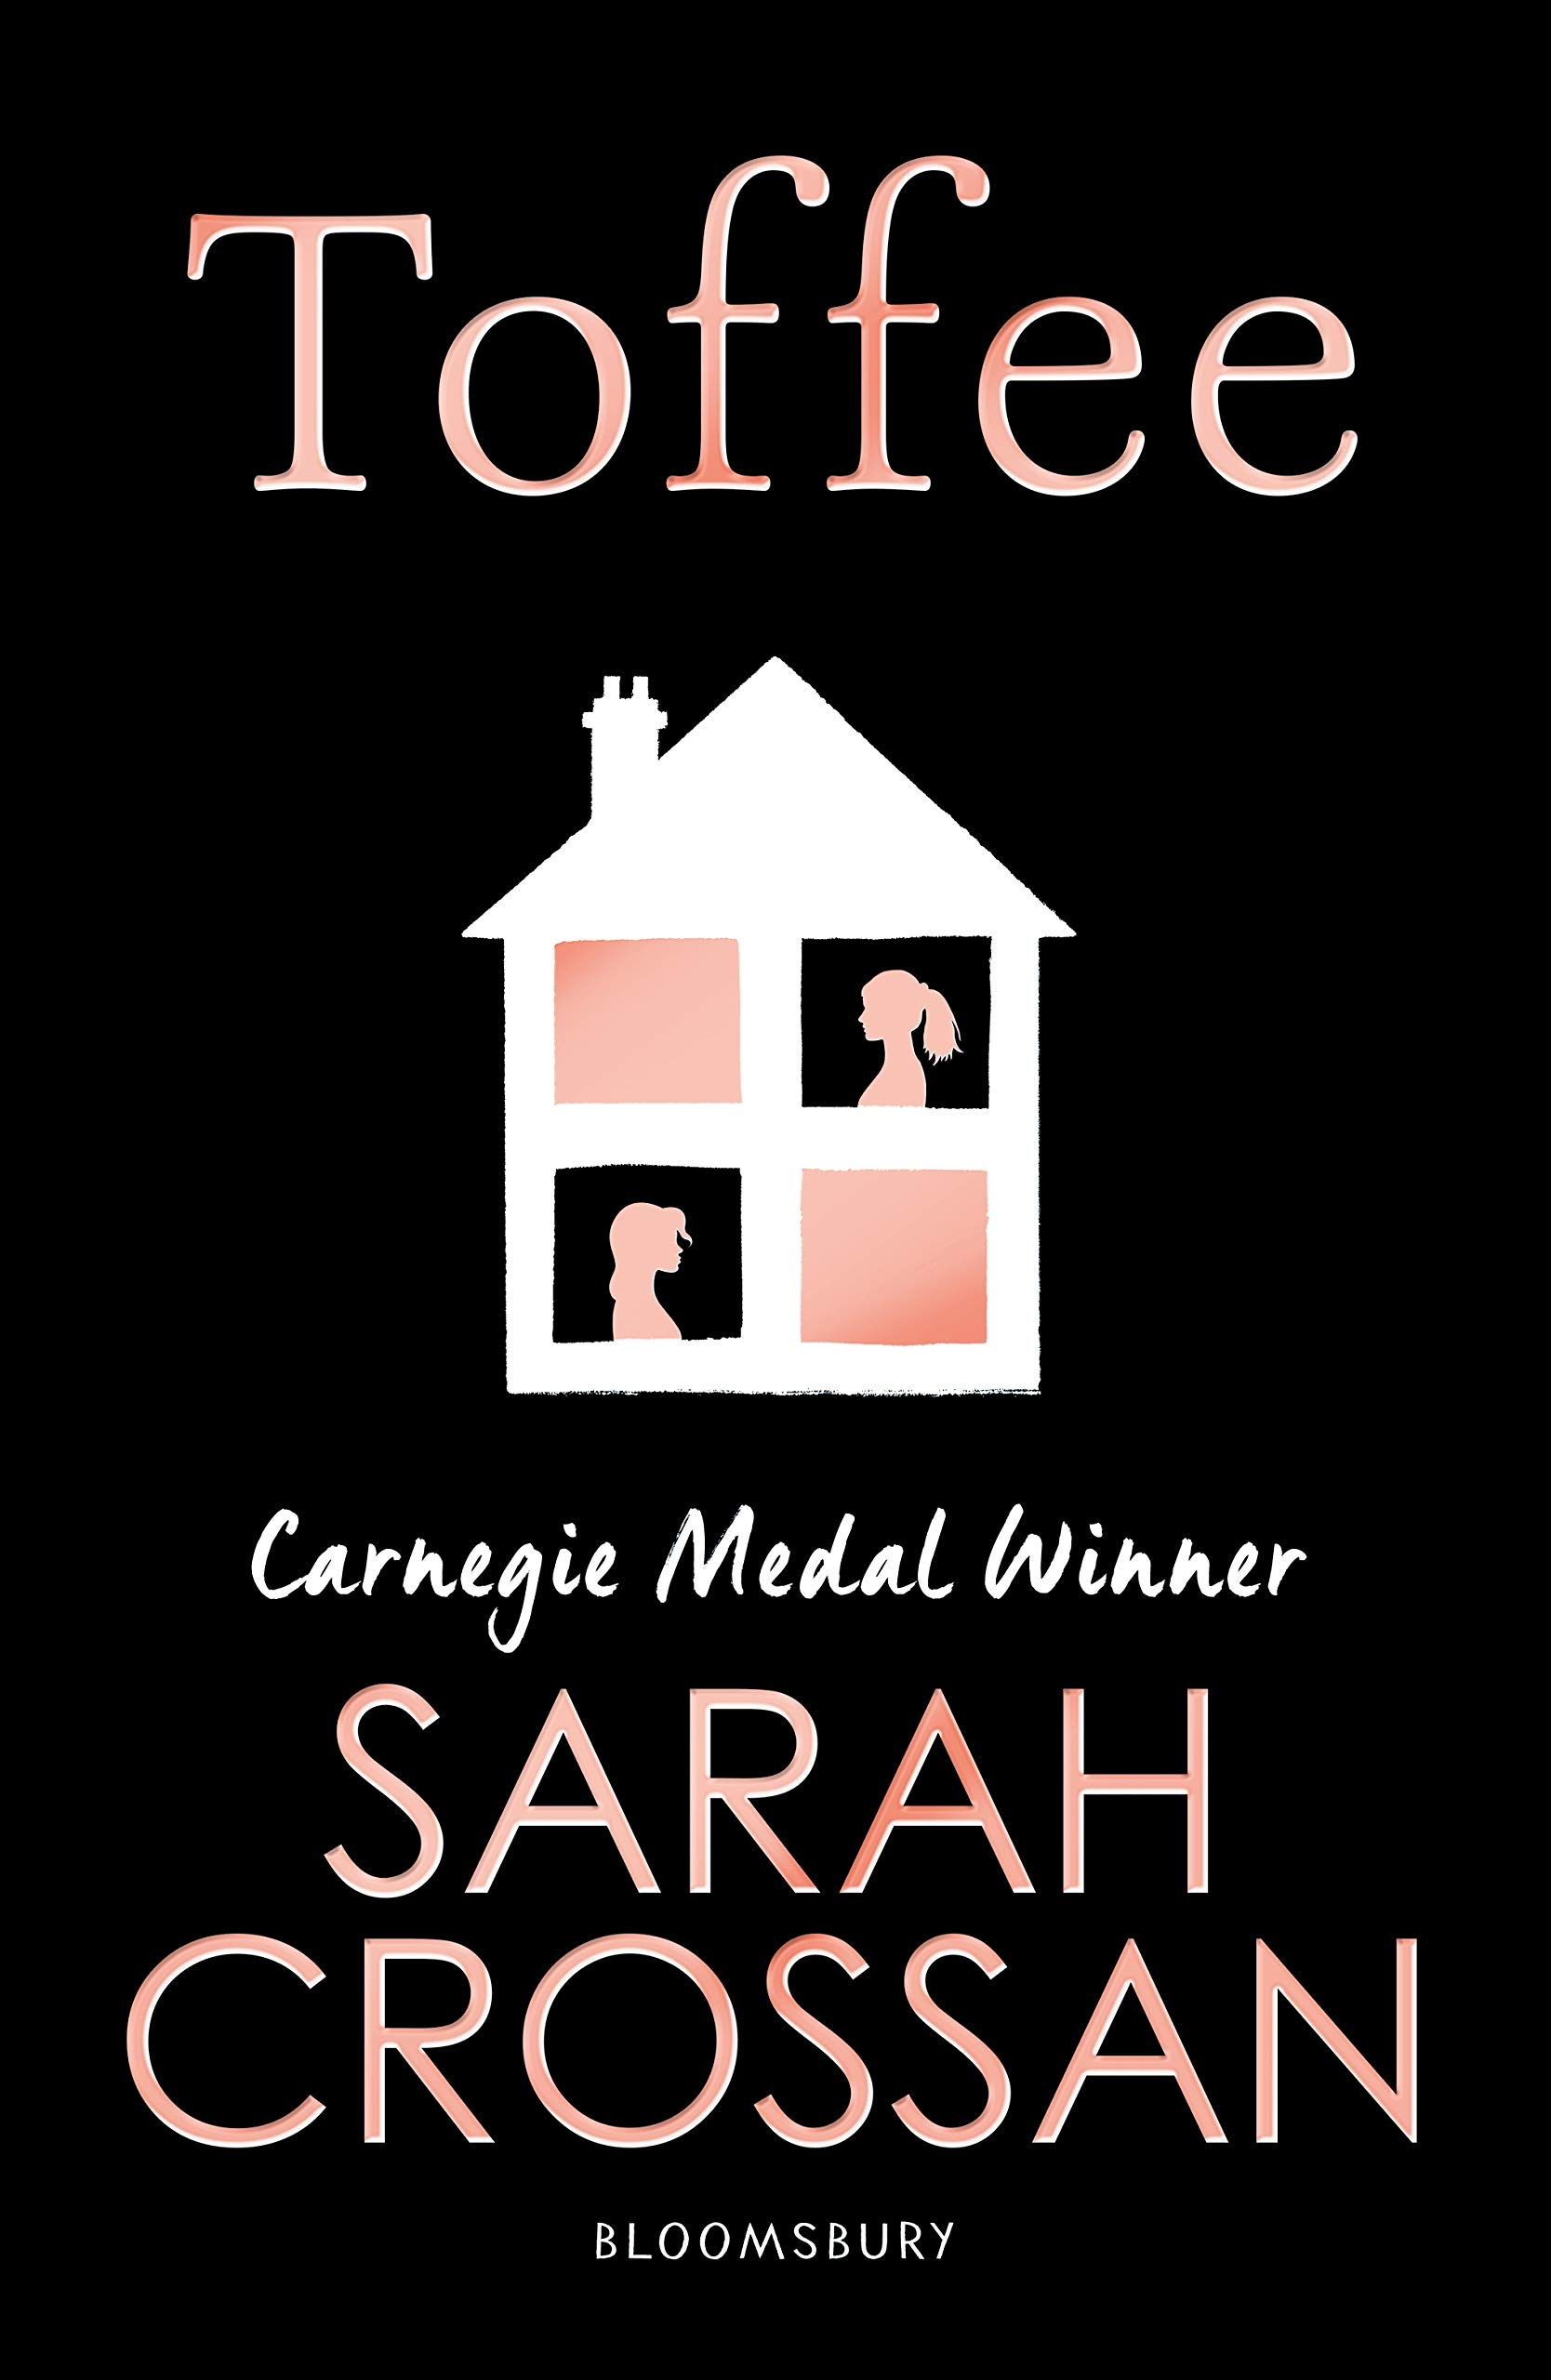 Toffee: Amazon.co.uk: Crossan, Sarah: Books